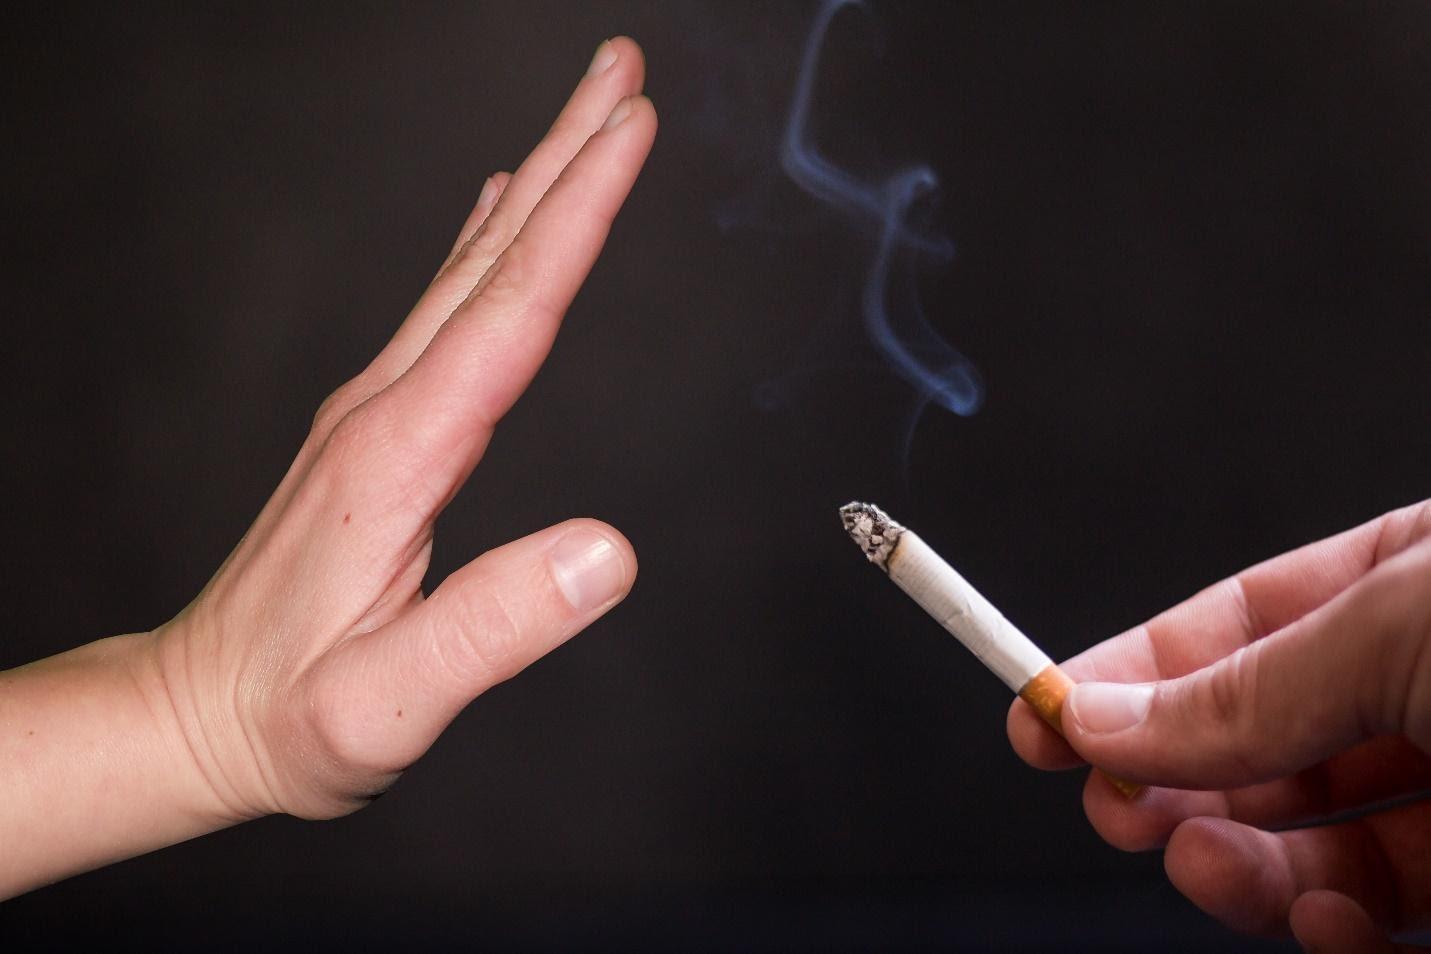 Ways To Cut Back On Smoking